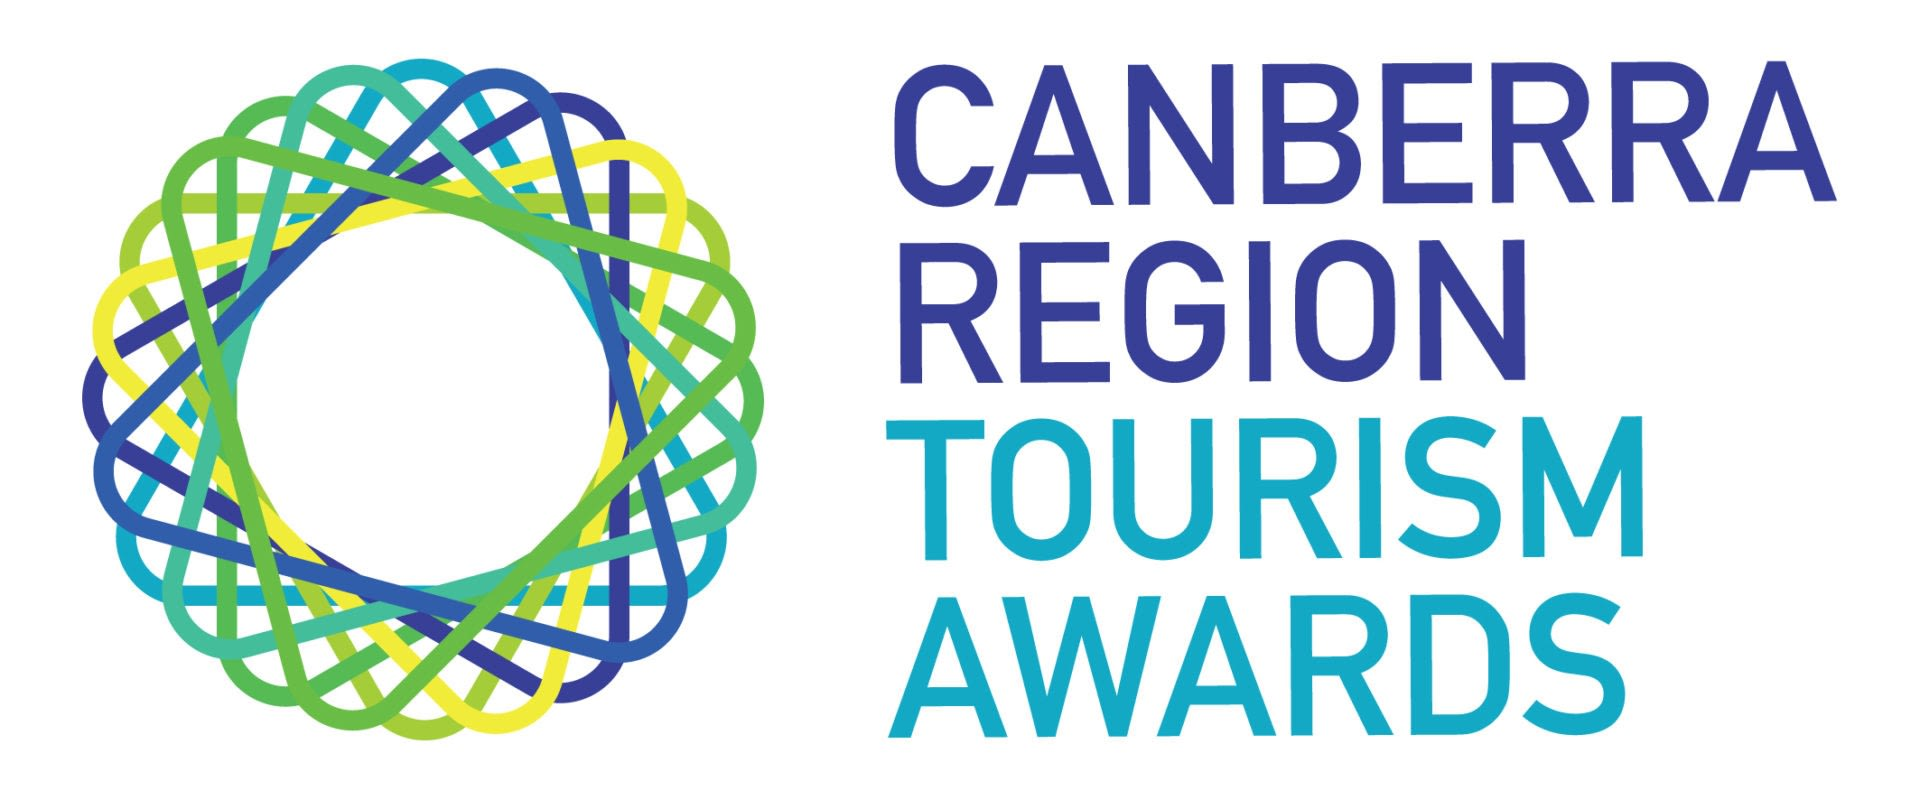 Canberra Region Tourism Awards